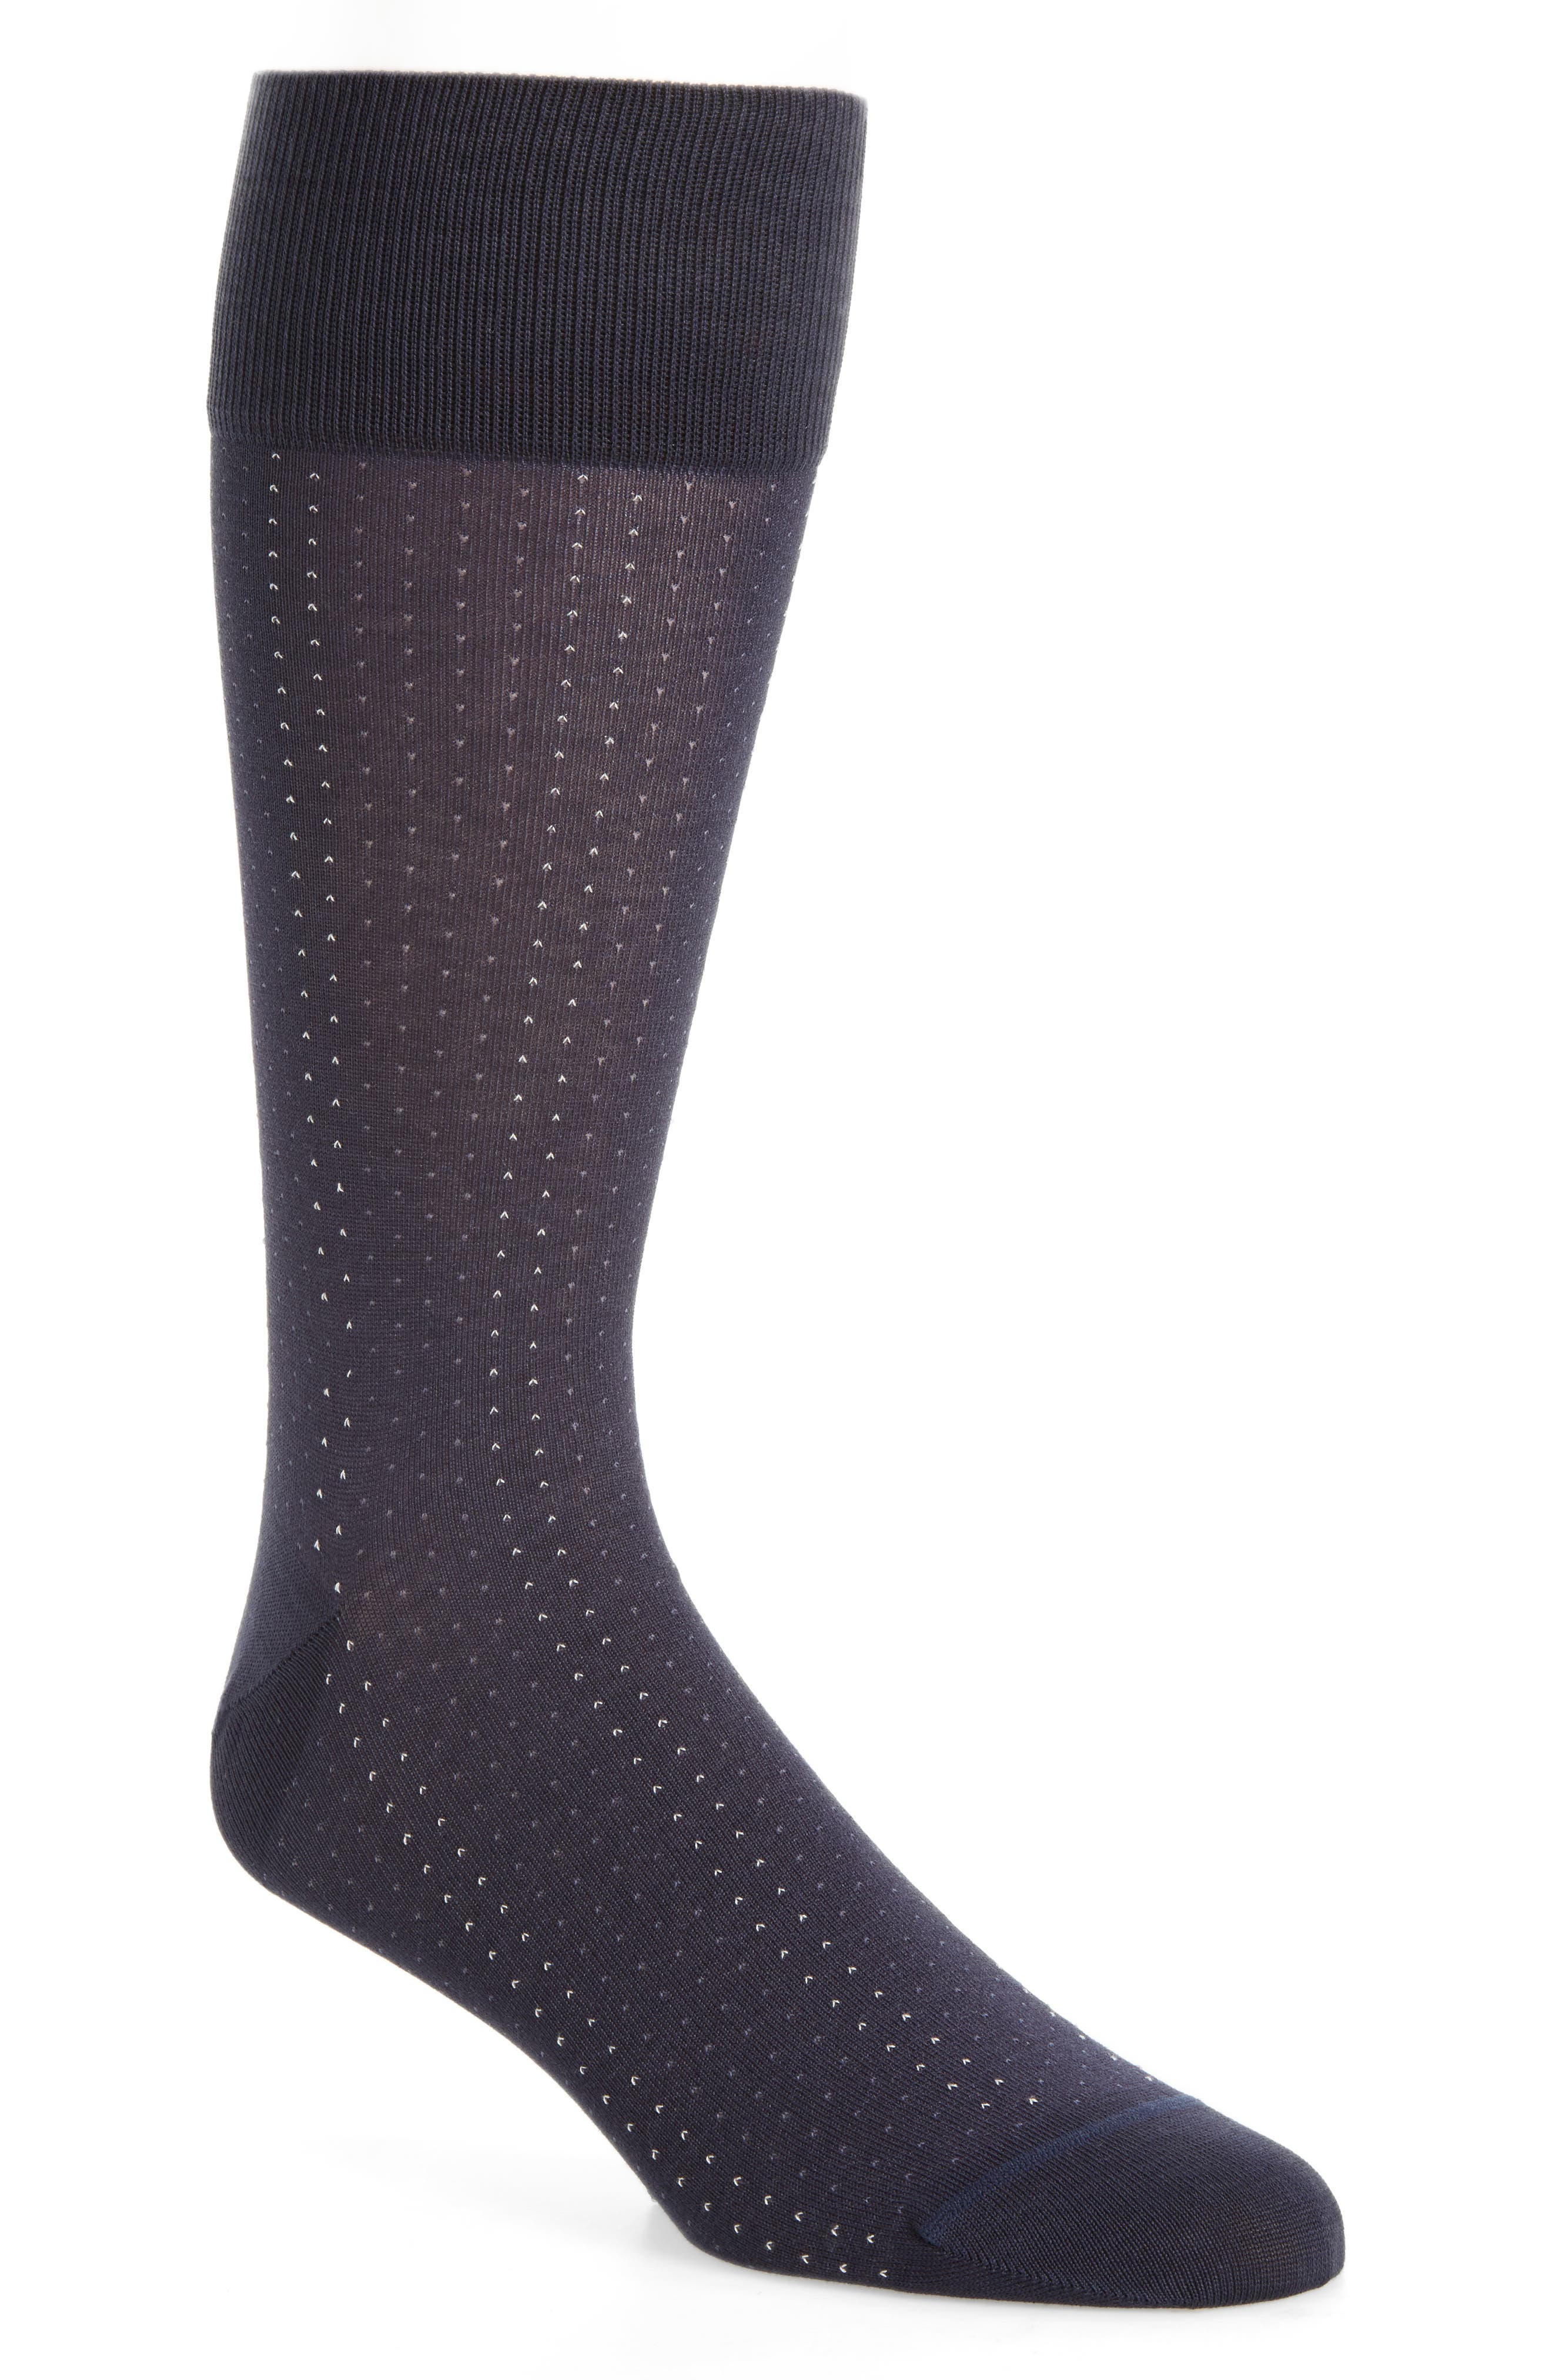 Alternate Image 1 Selected - John W. Nordstrom® Birdseye Socks